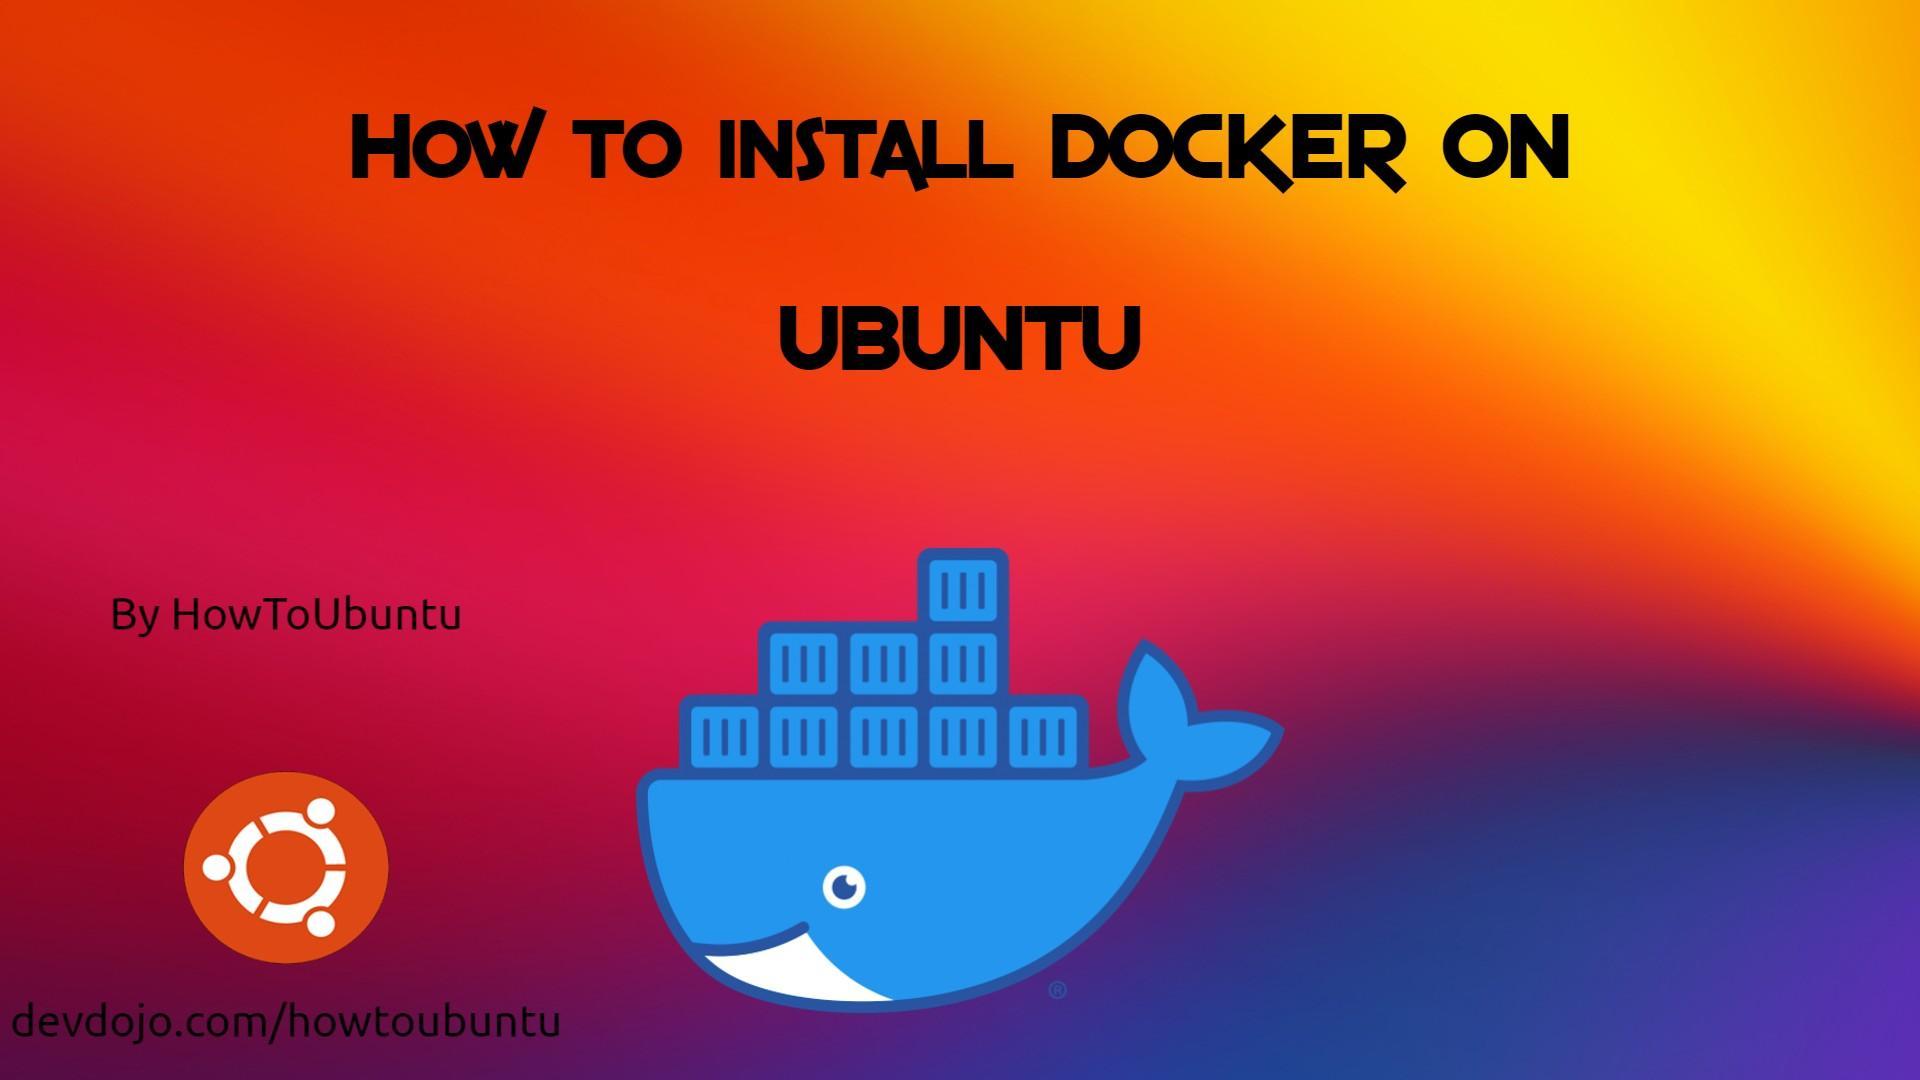 How To Install Docker on Ubuntu!